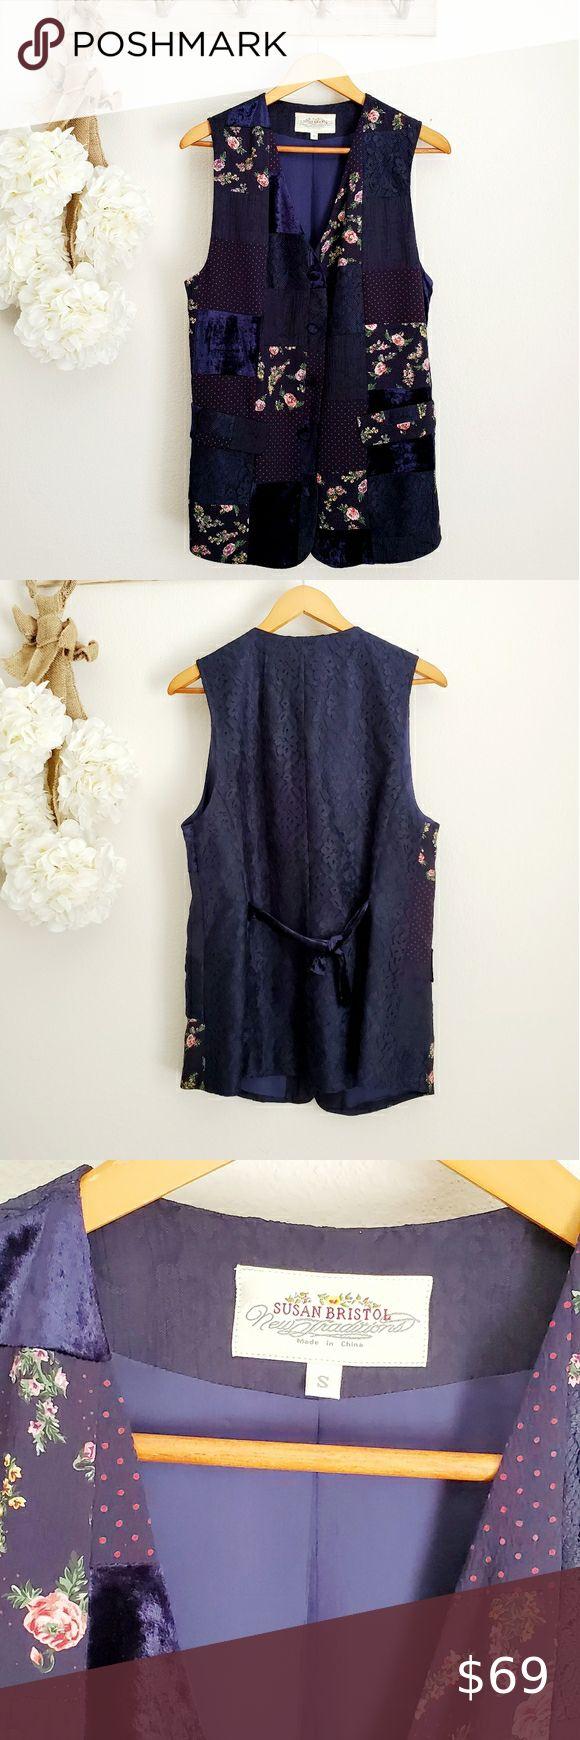 V I N T A G E 90s Susan Bristol Blue Velvet Vest Fashion Clothes Design Fashion Tips [ 1740 x 580 Pixel ]